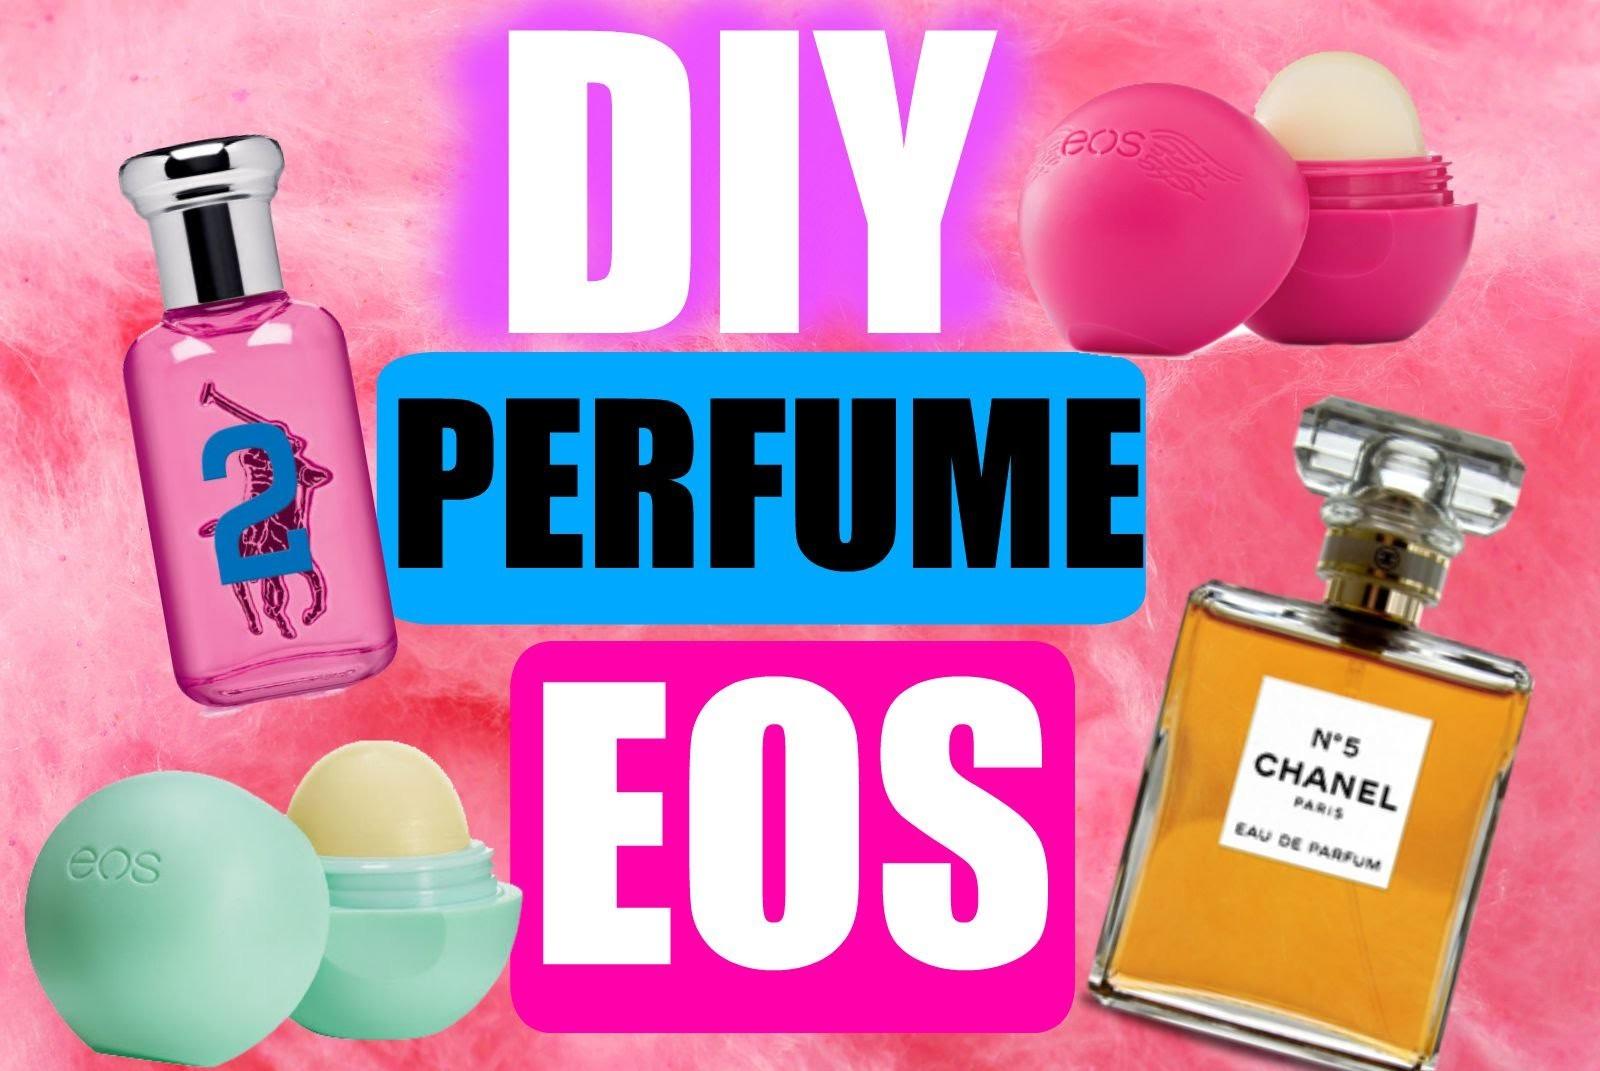 DIY perfume EOS